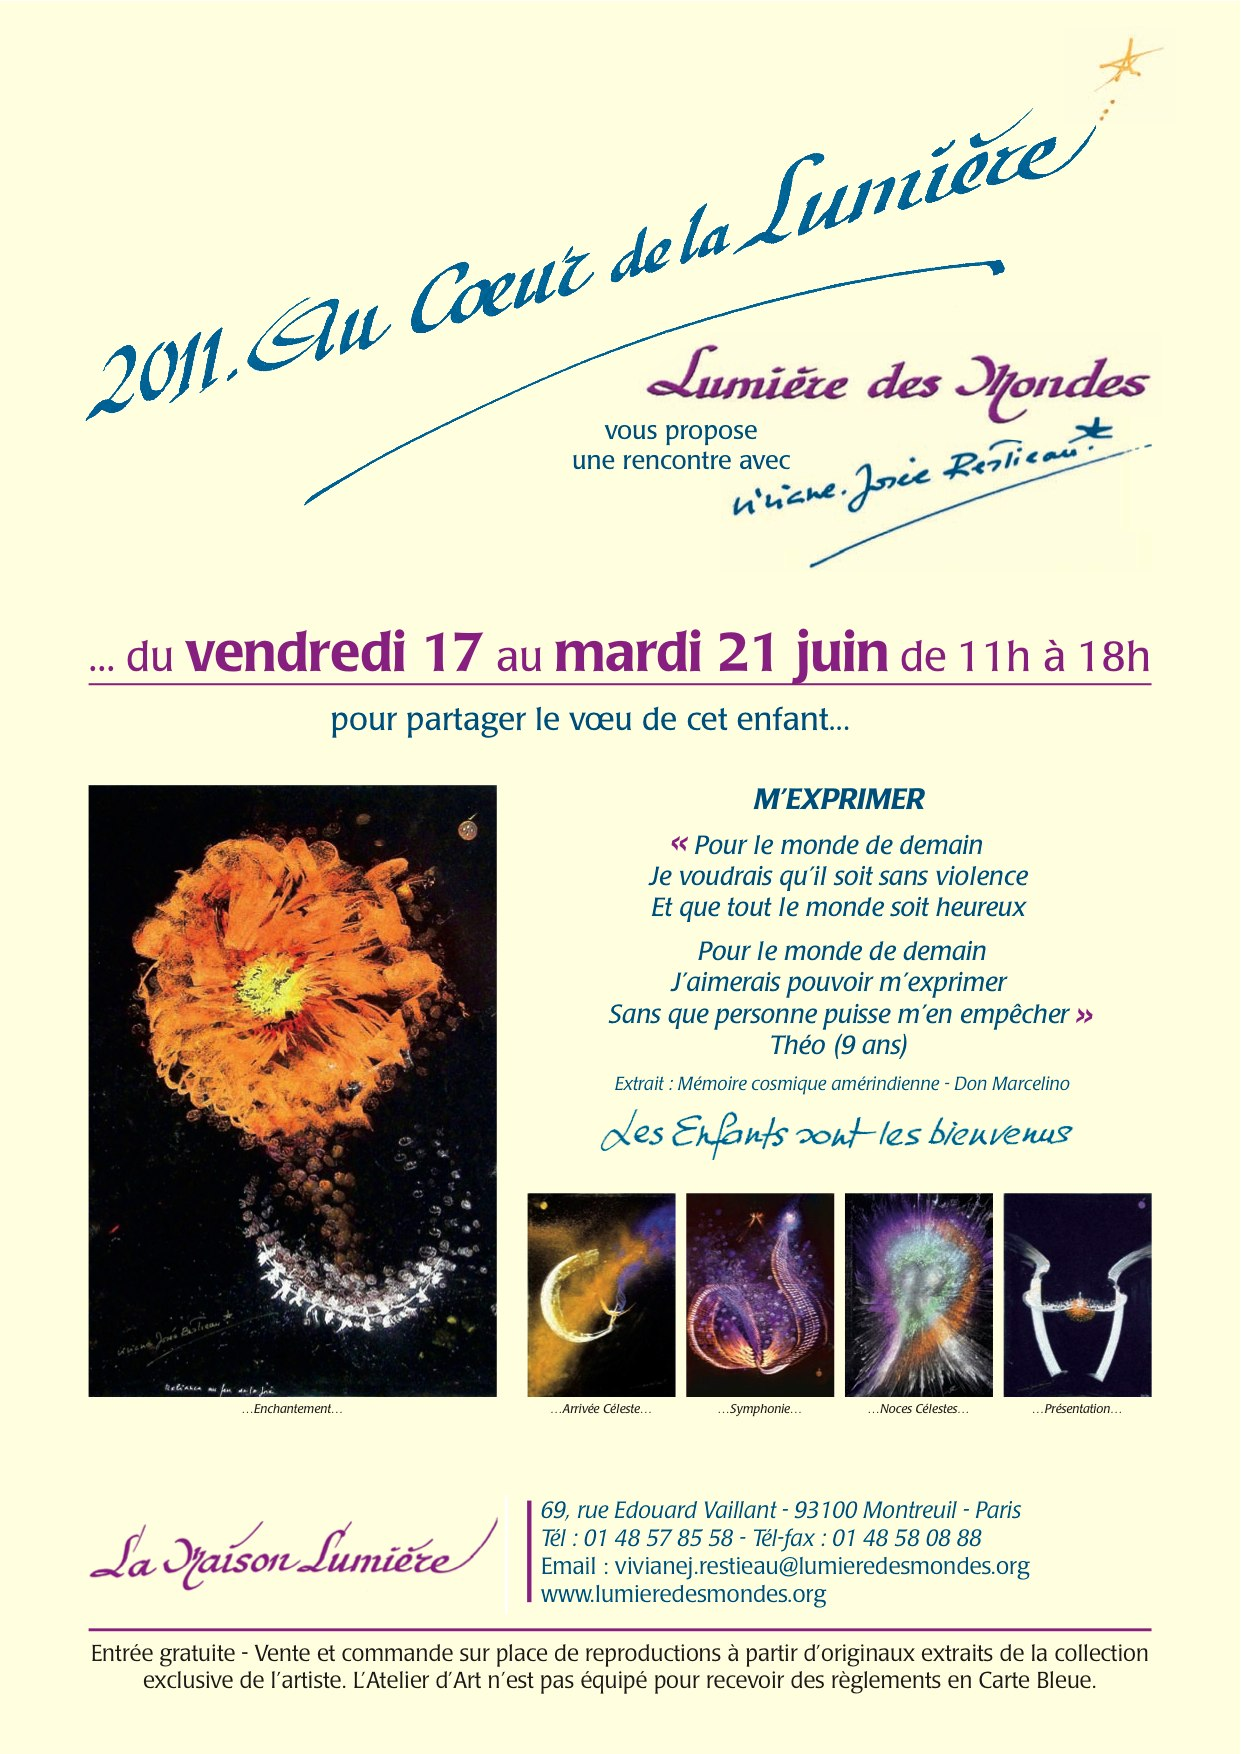 Invitation Viviane-Josée Restieau - Expo juin 2011